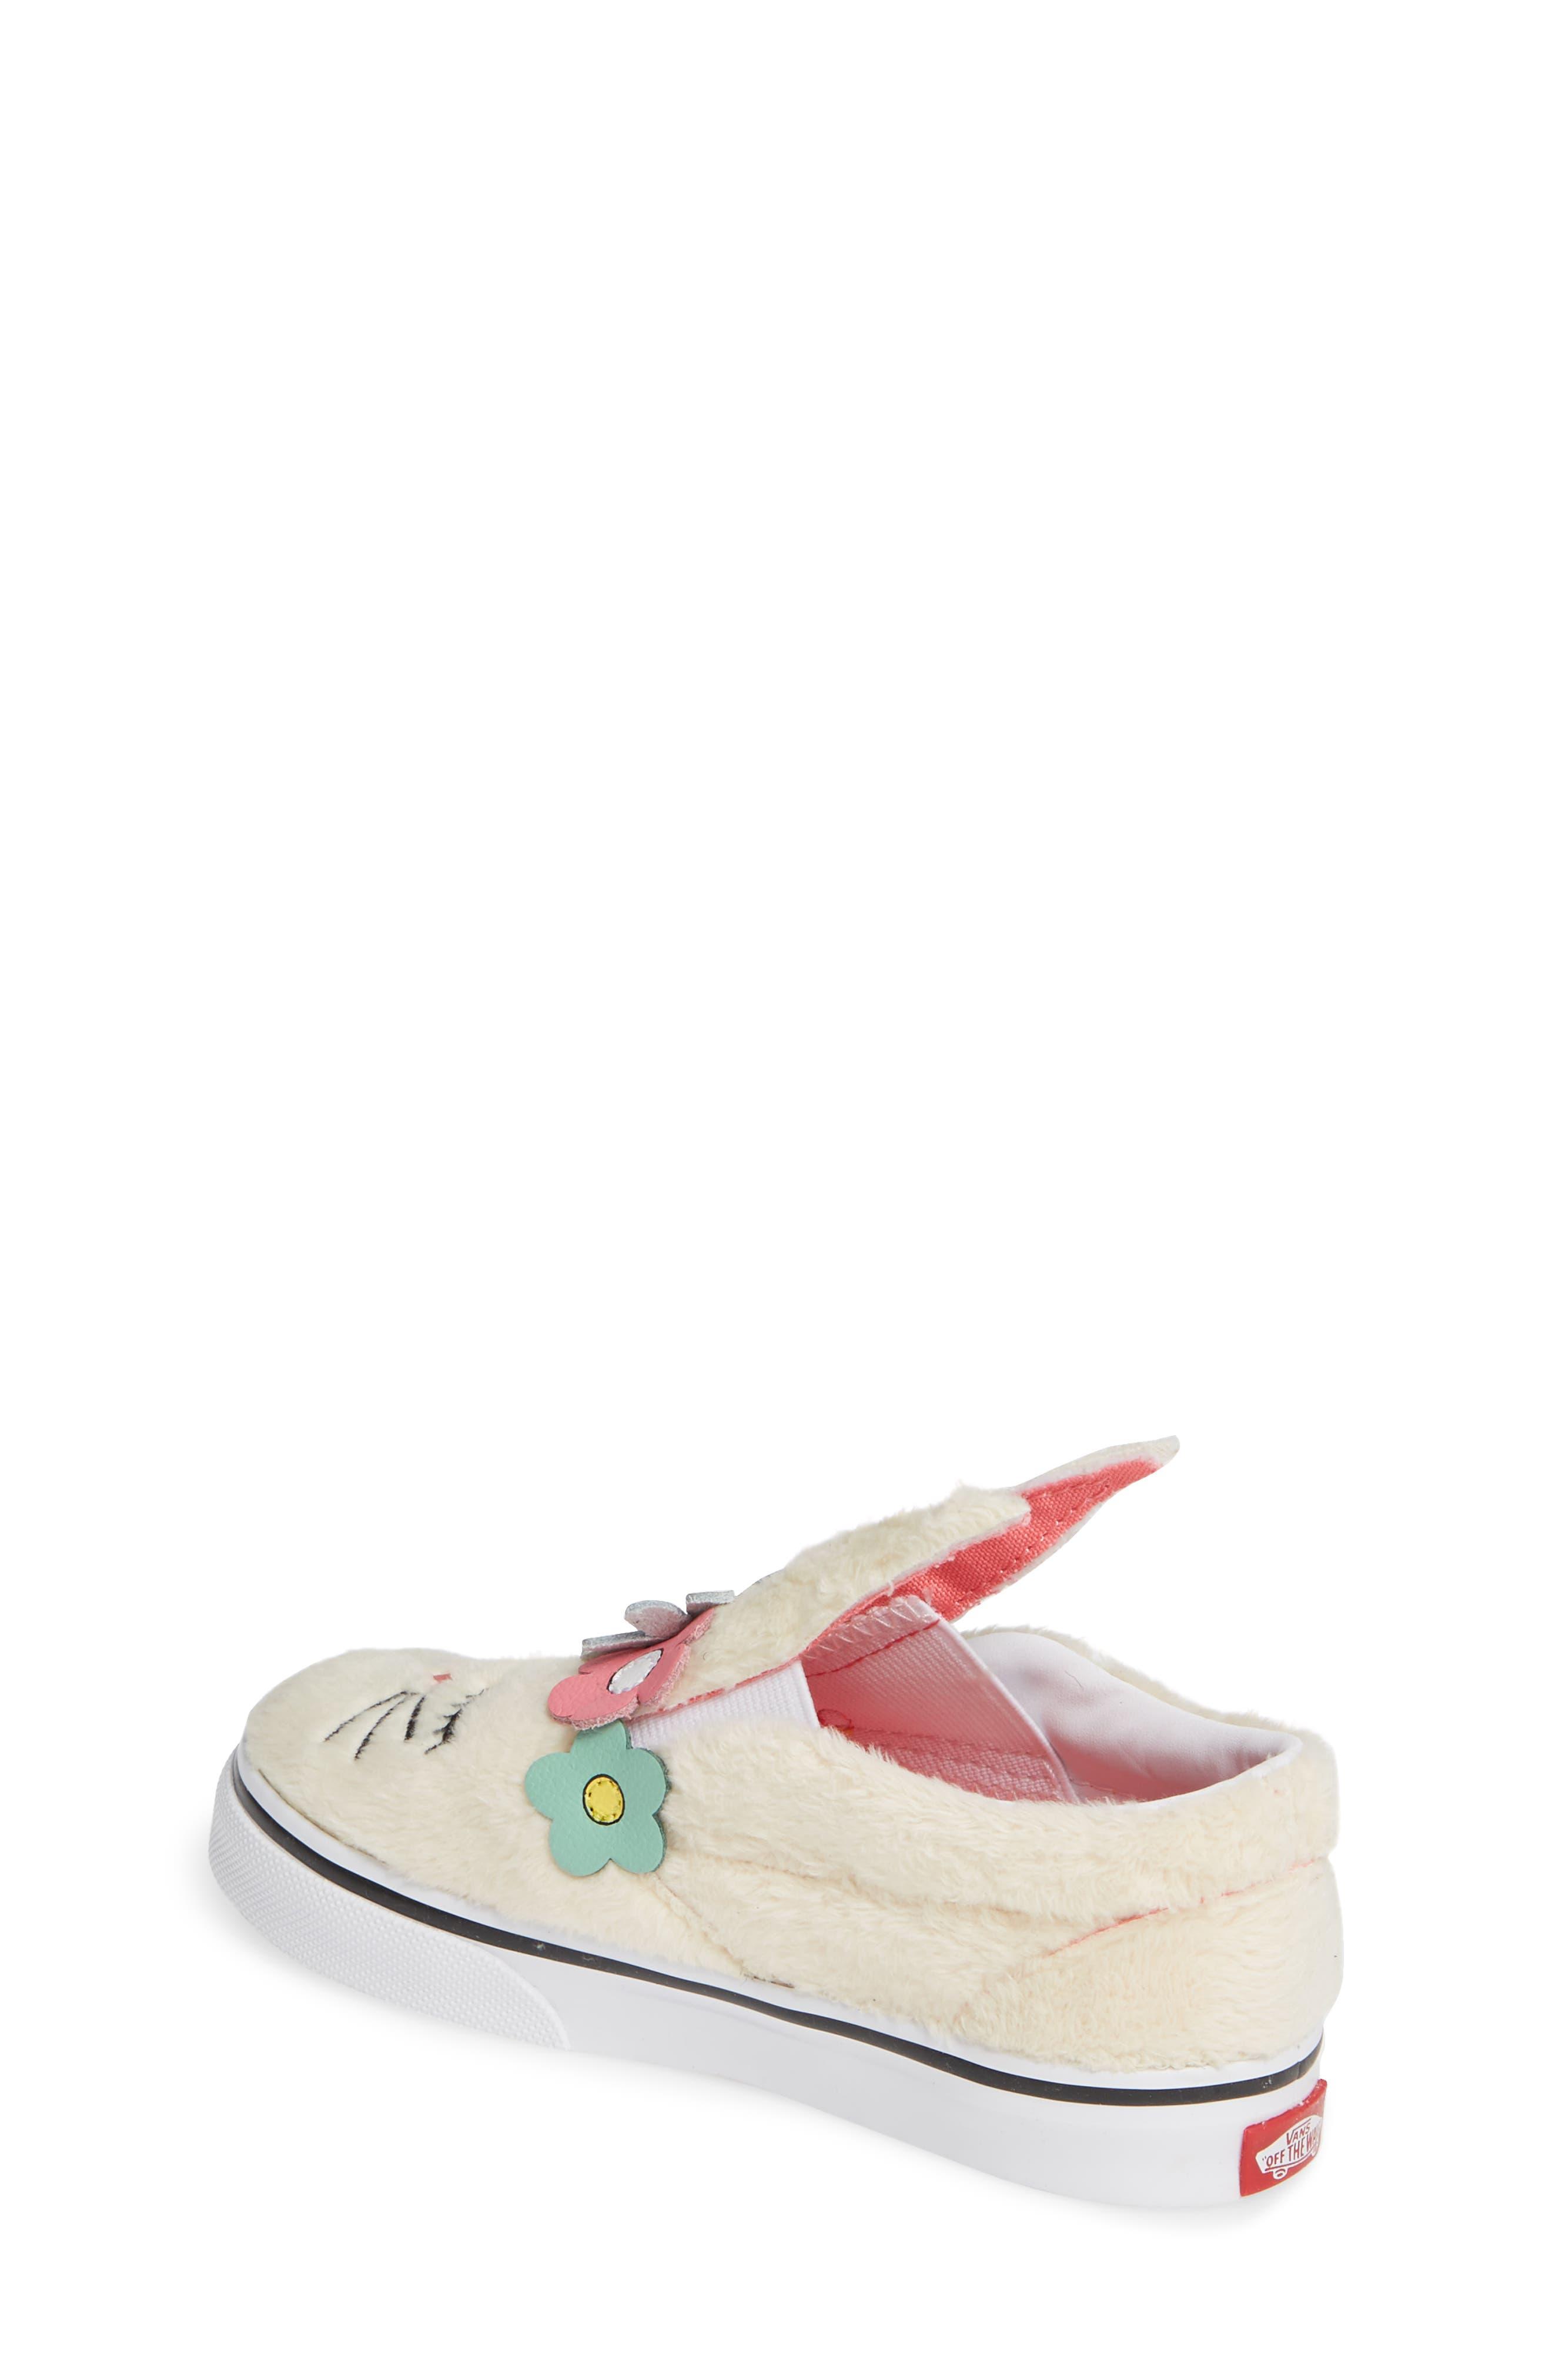 VANS, Slip-On Bunny Sneaker, Alternate thumbnail 2, color, VANILLA CUSTARD